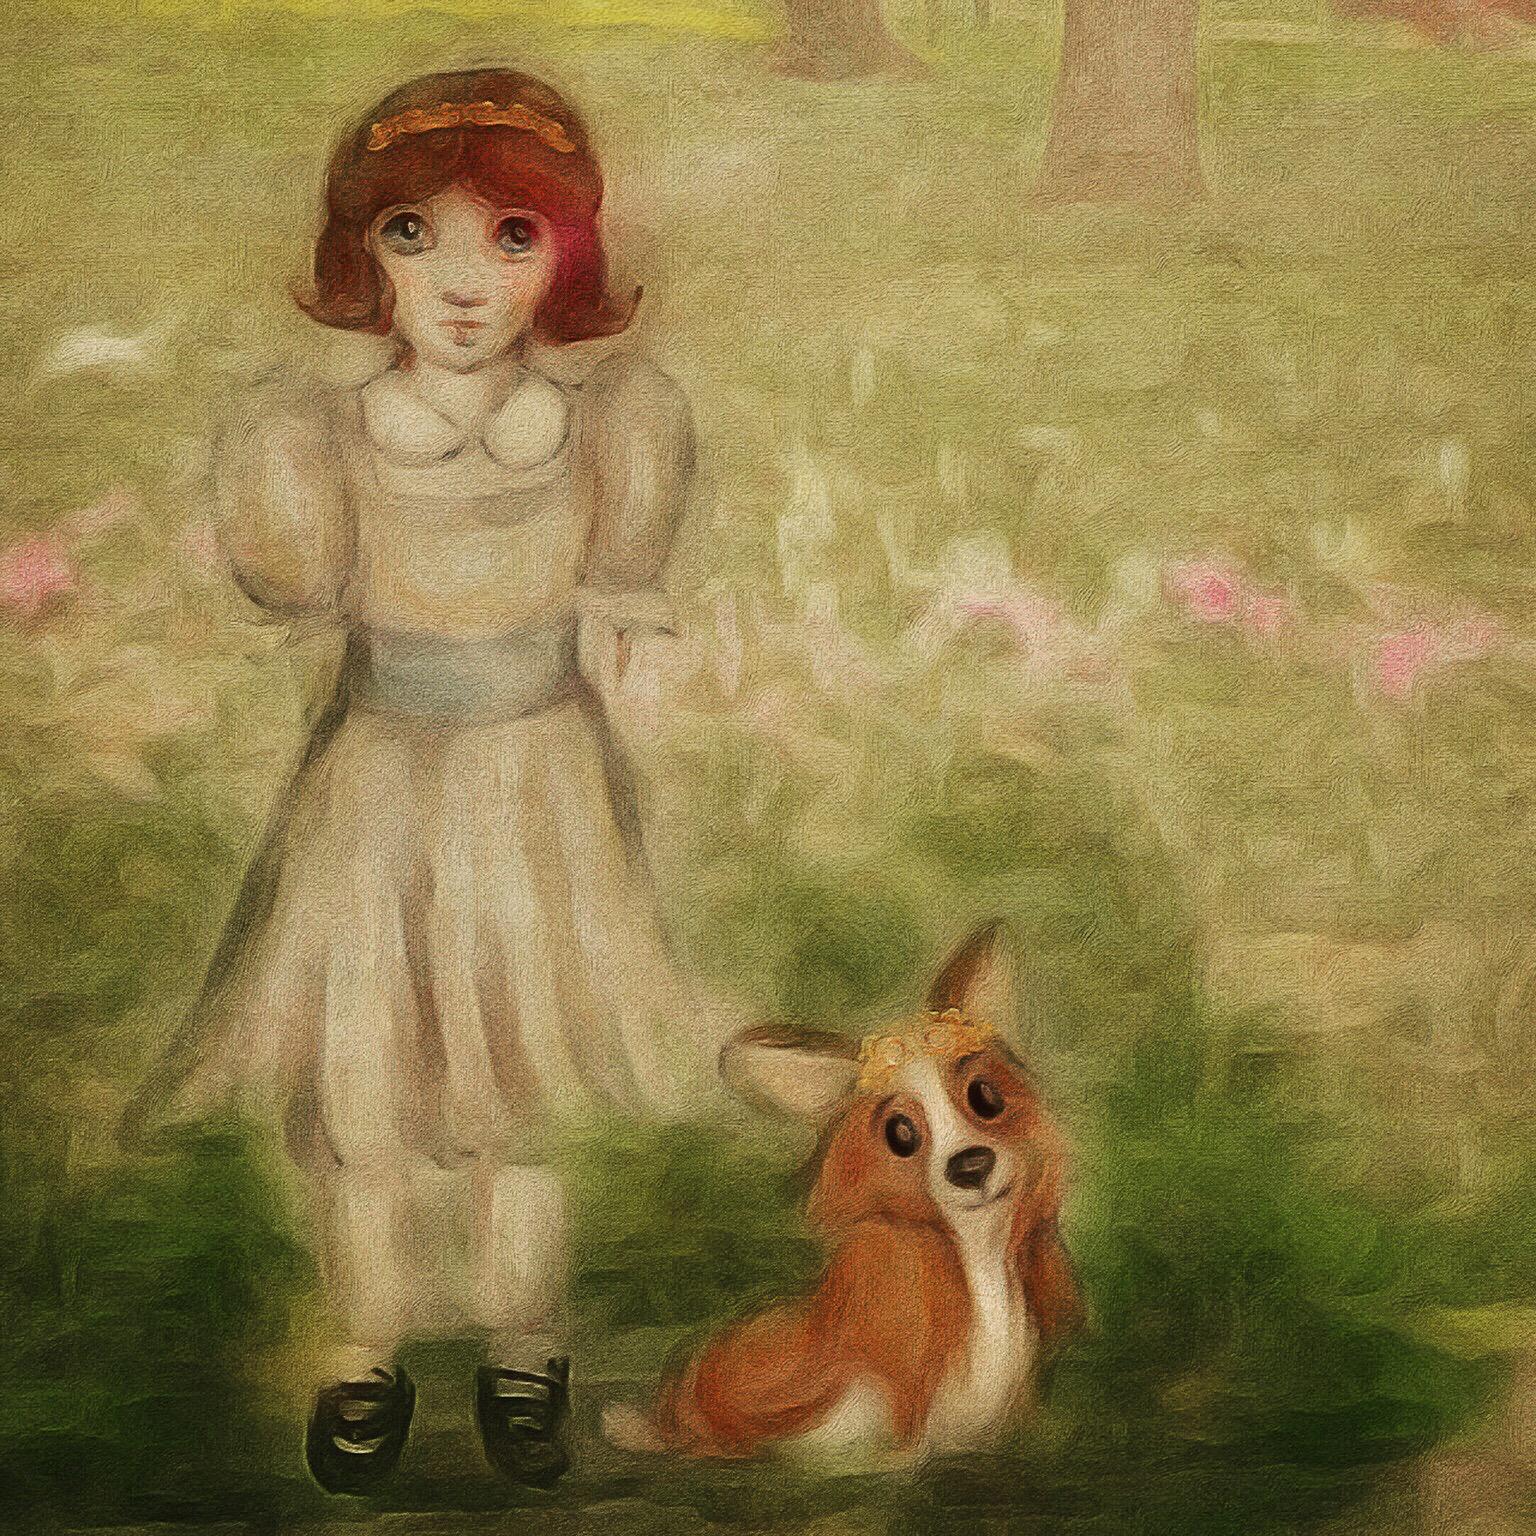 queen-elizabeth-child-dookie-corgi-illustration.jpg